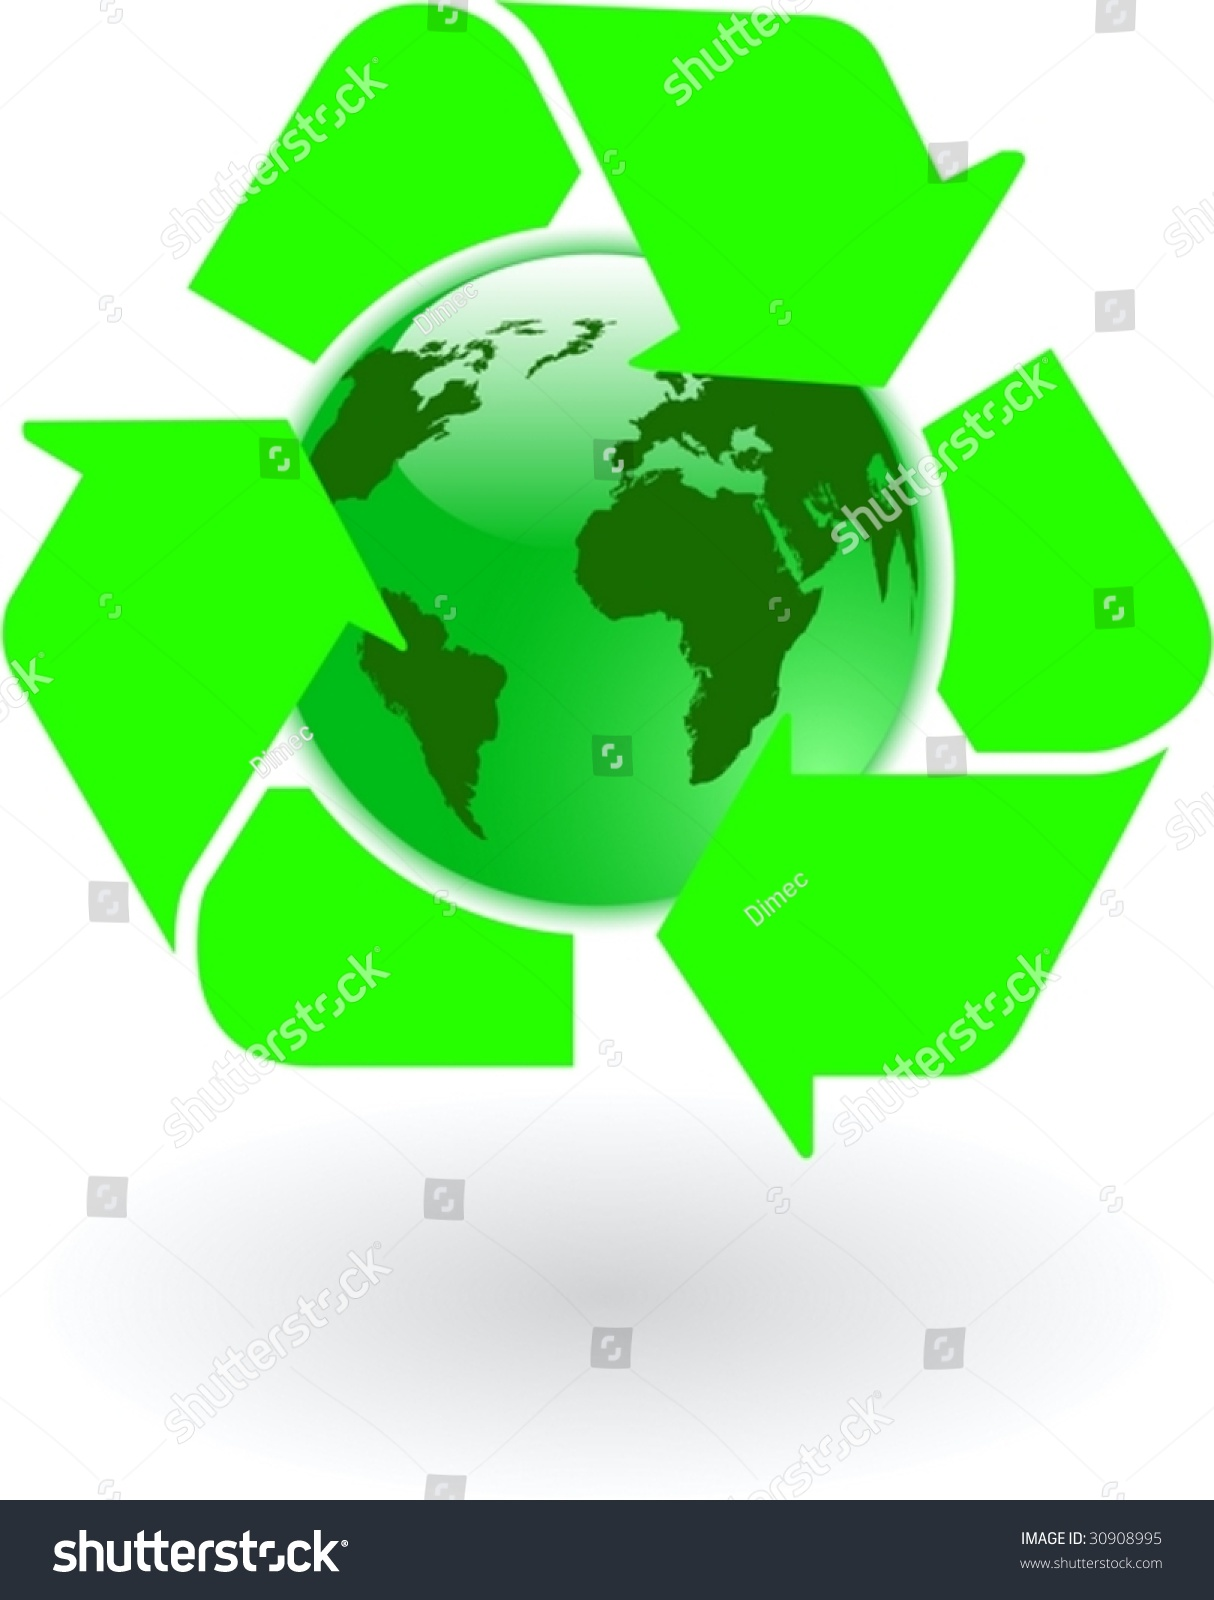 Vector green world globe recycling symbol stock vector 30908995 the vector green world globe with recycling symbol buycottarizona Image collections